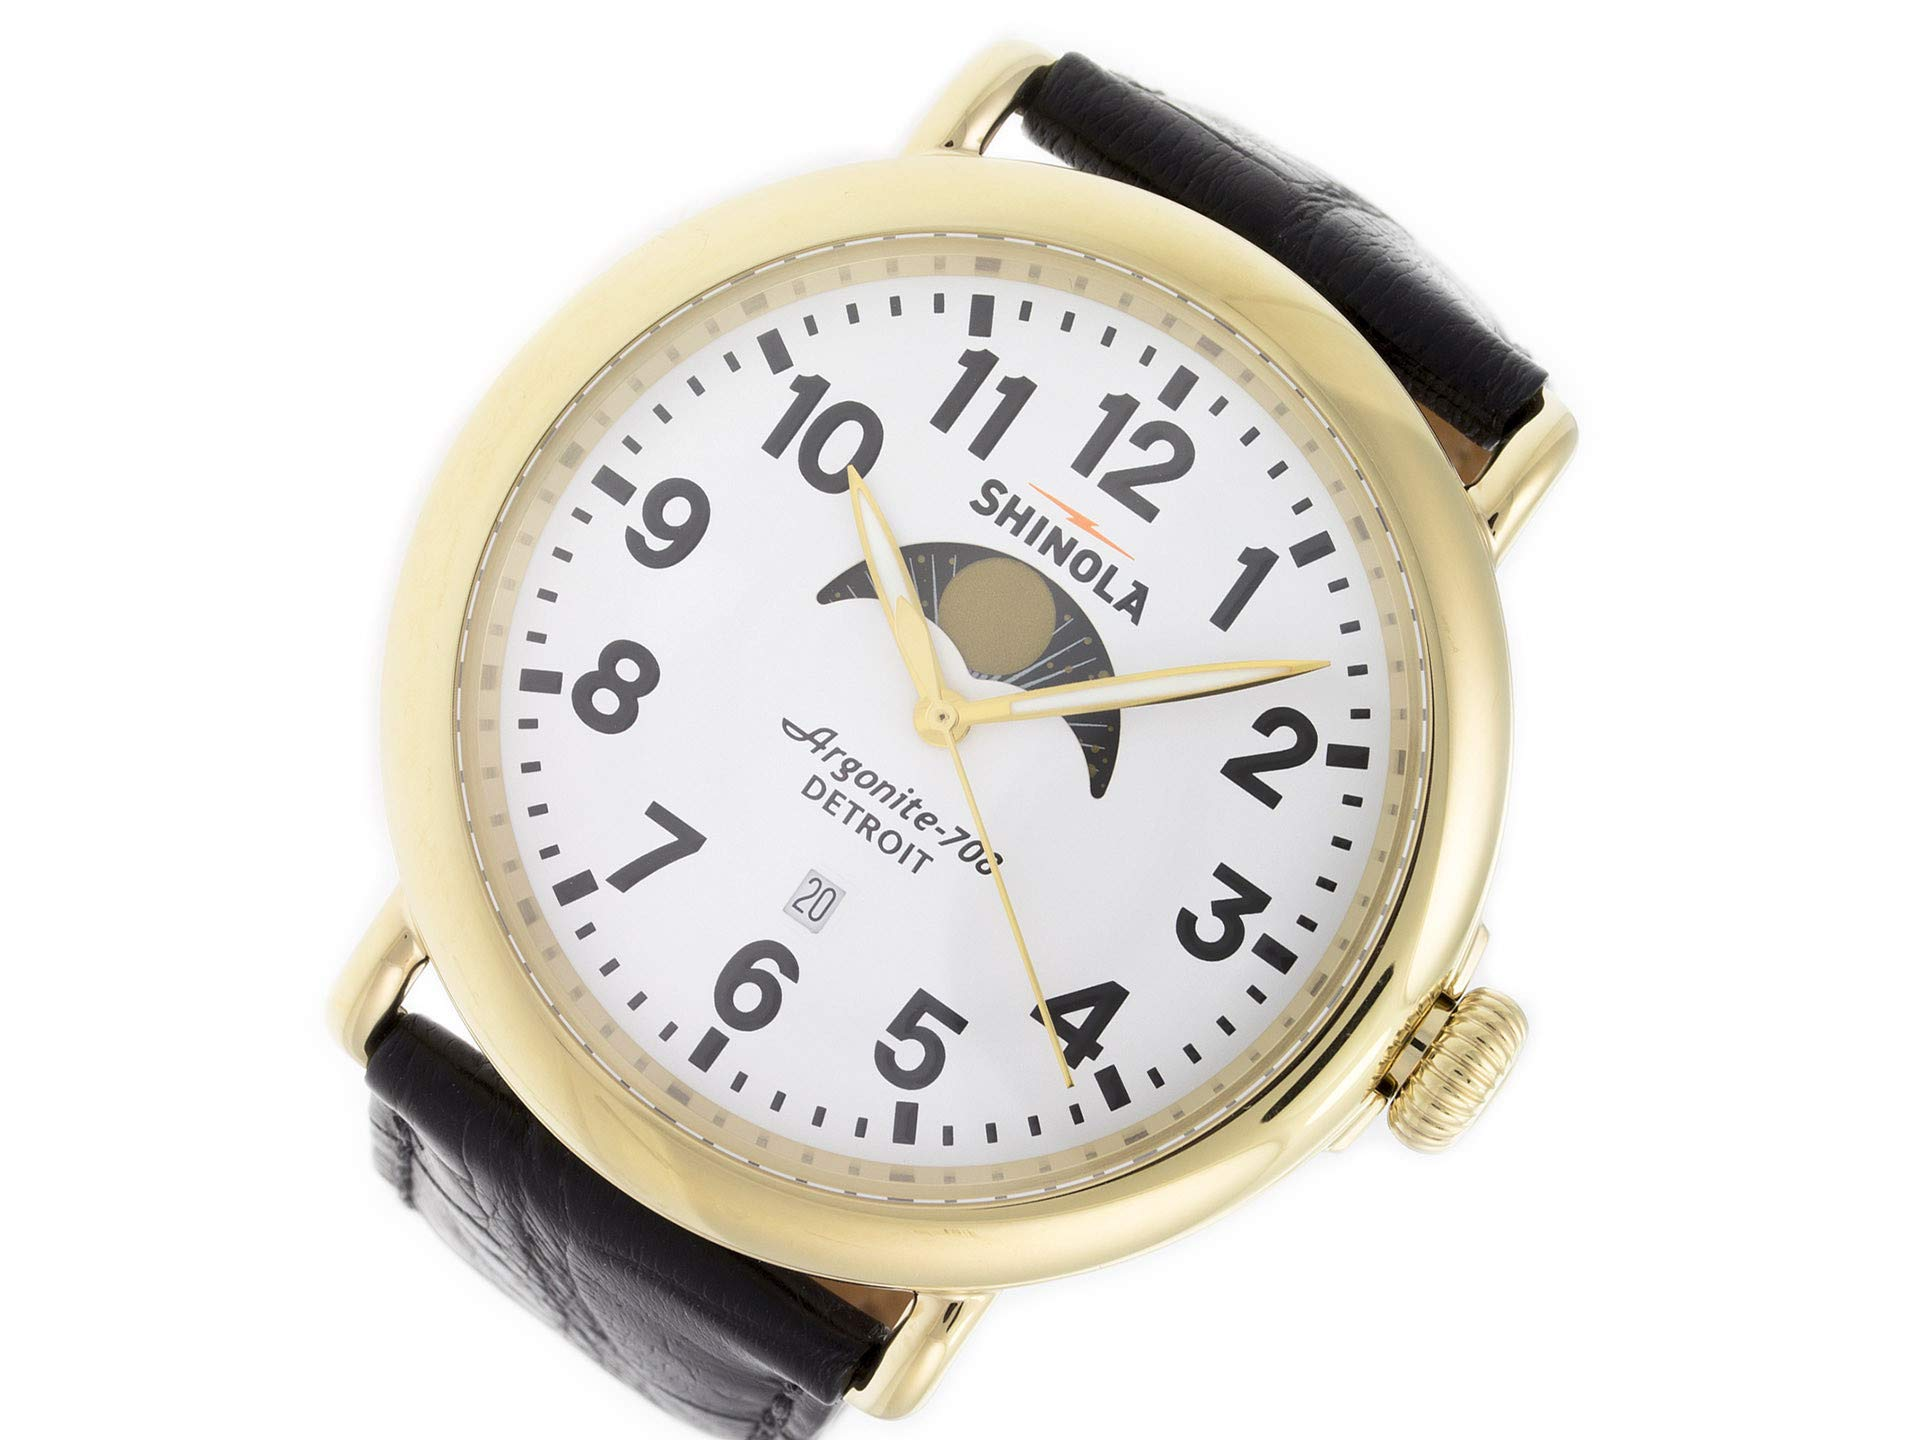 Shinola The Runwell Quartz Male Watch 10000180 (Certified Pre-Owned)